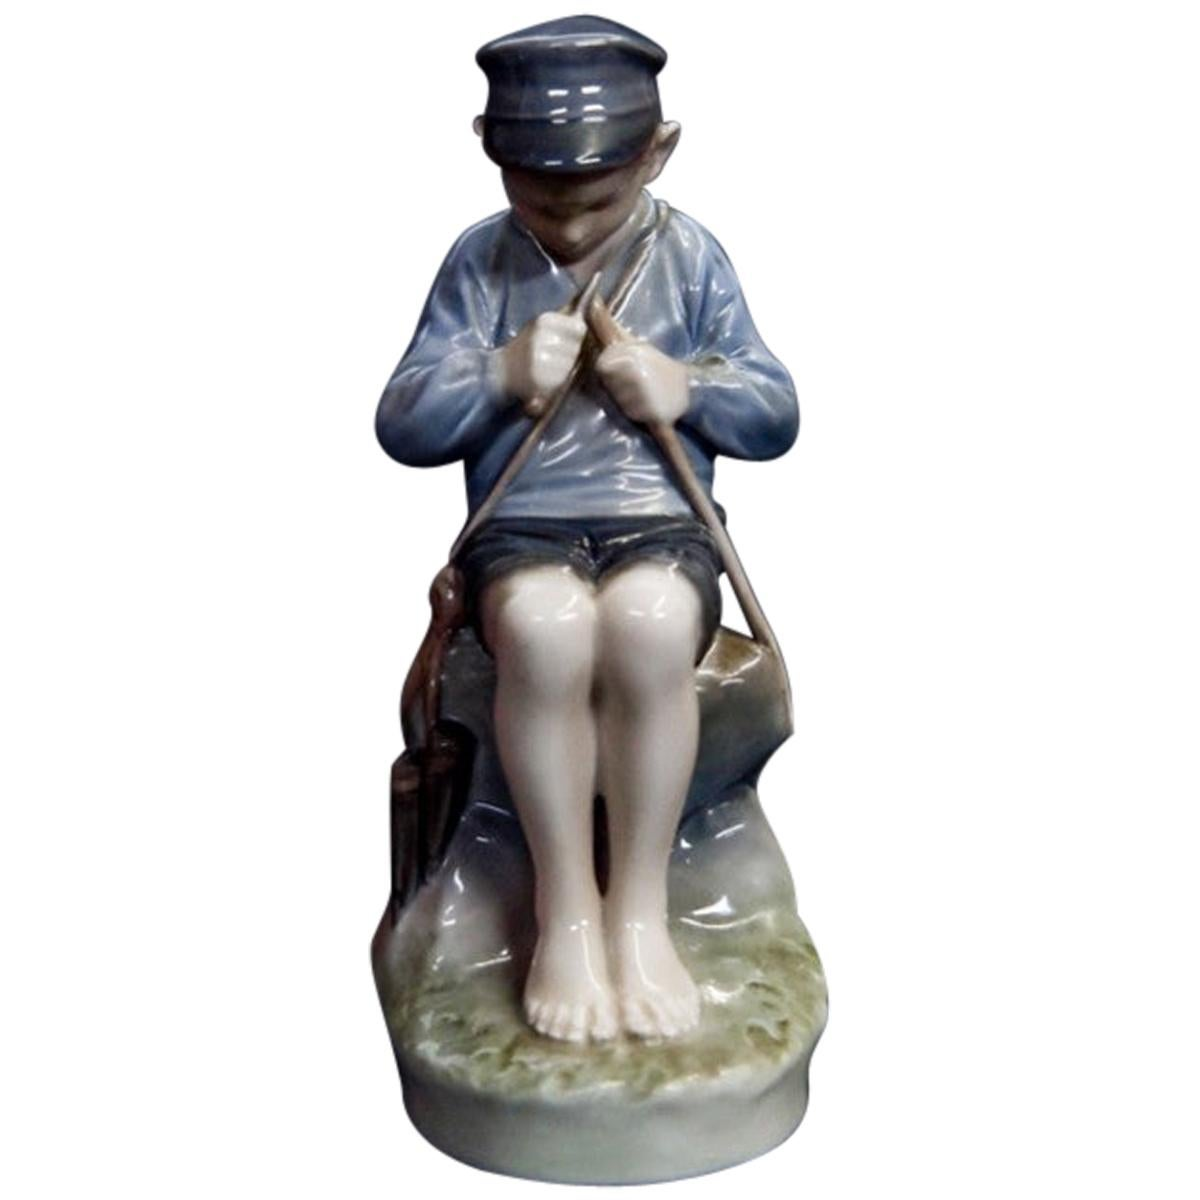 Royal Copenhagen Porcelain Figurine No. 905